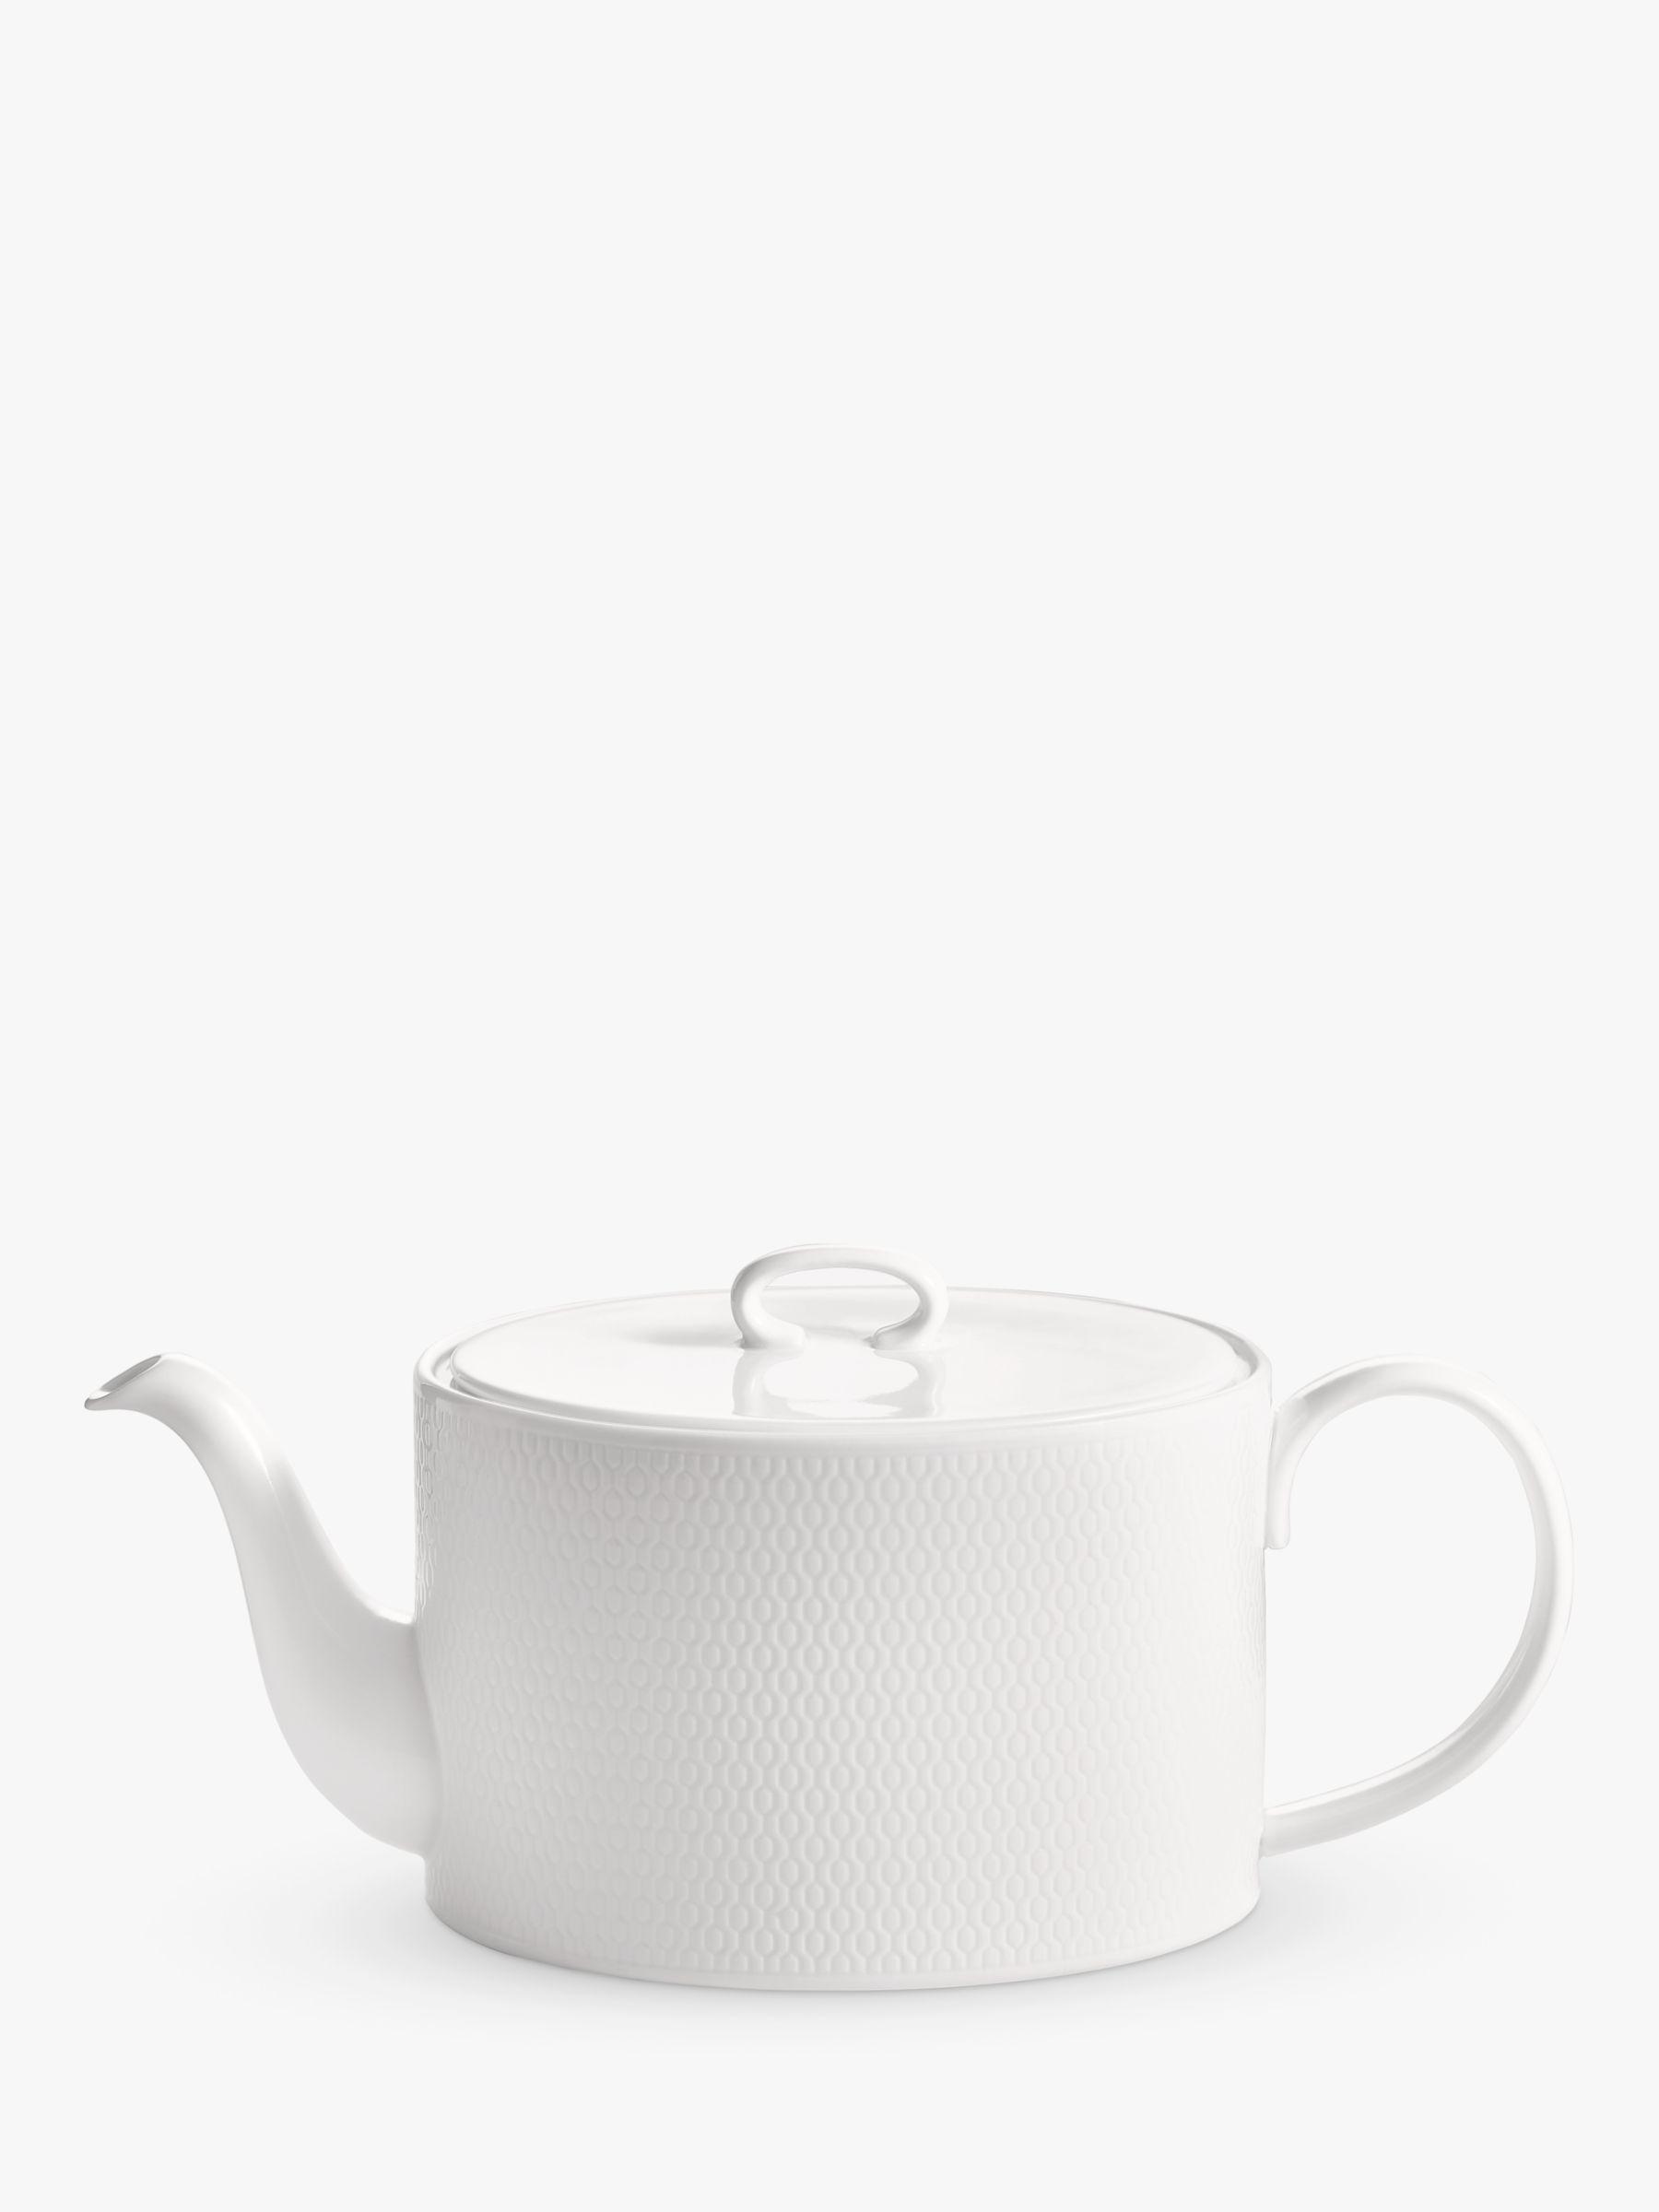 Wedgwood Wedgwood Gio 4 Cup Teapot, White, 1L